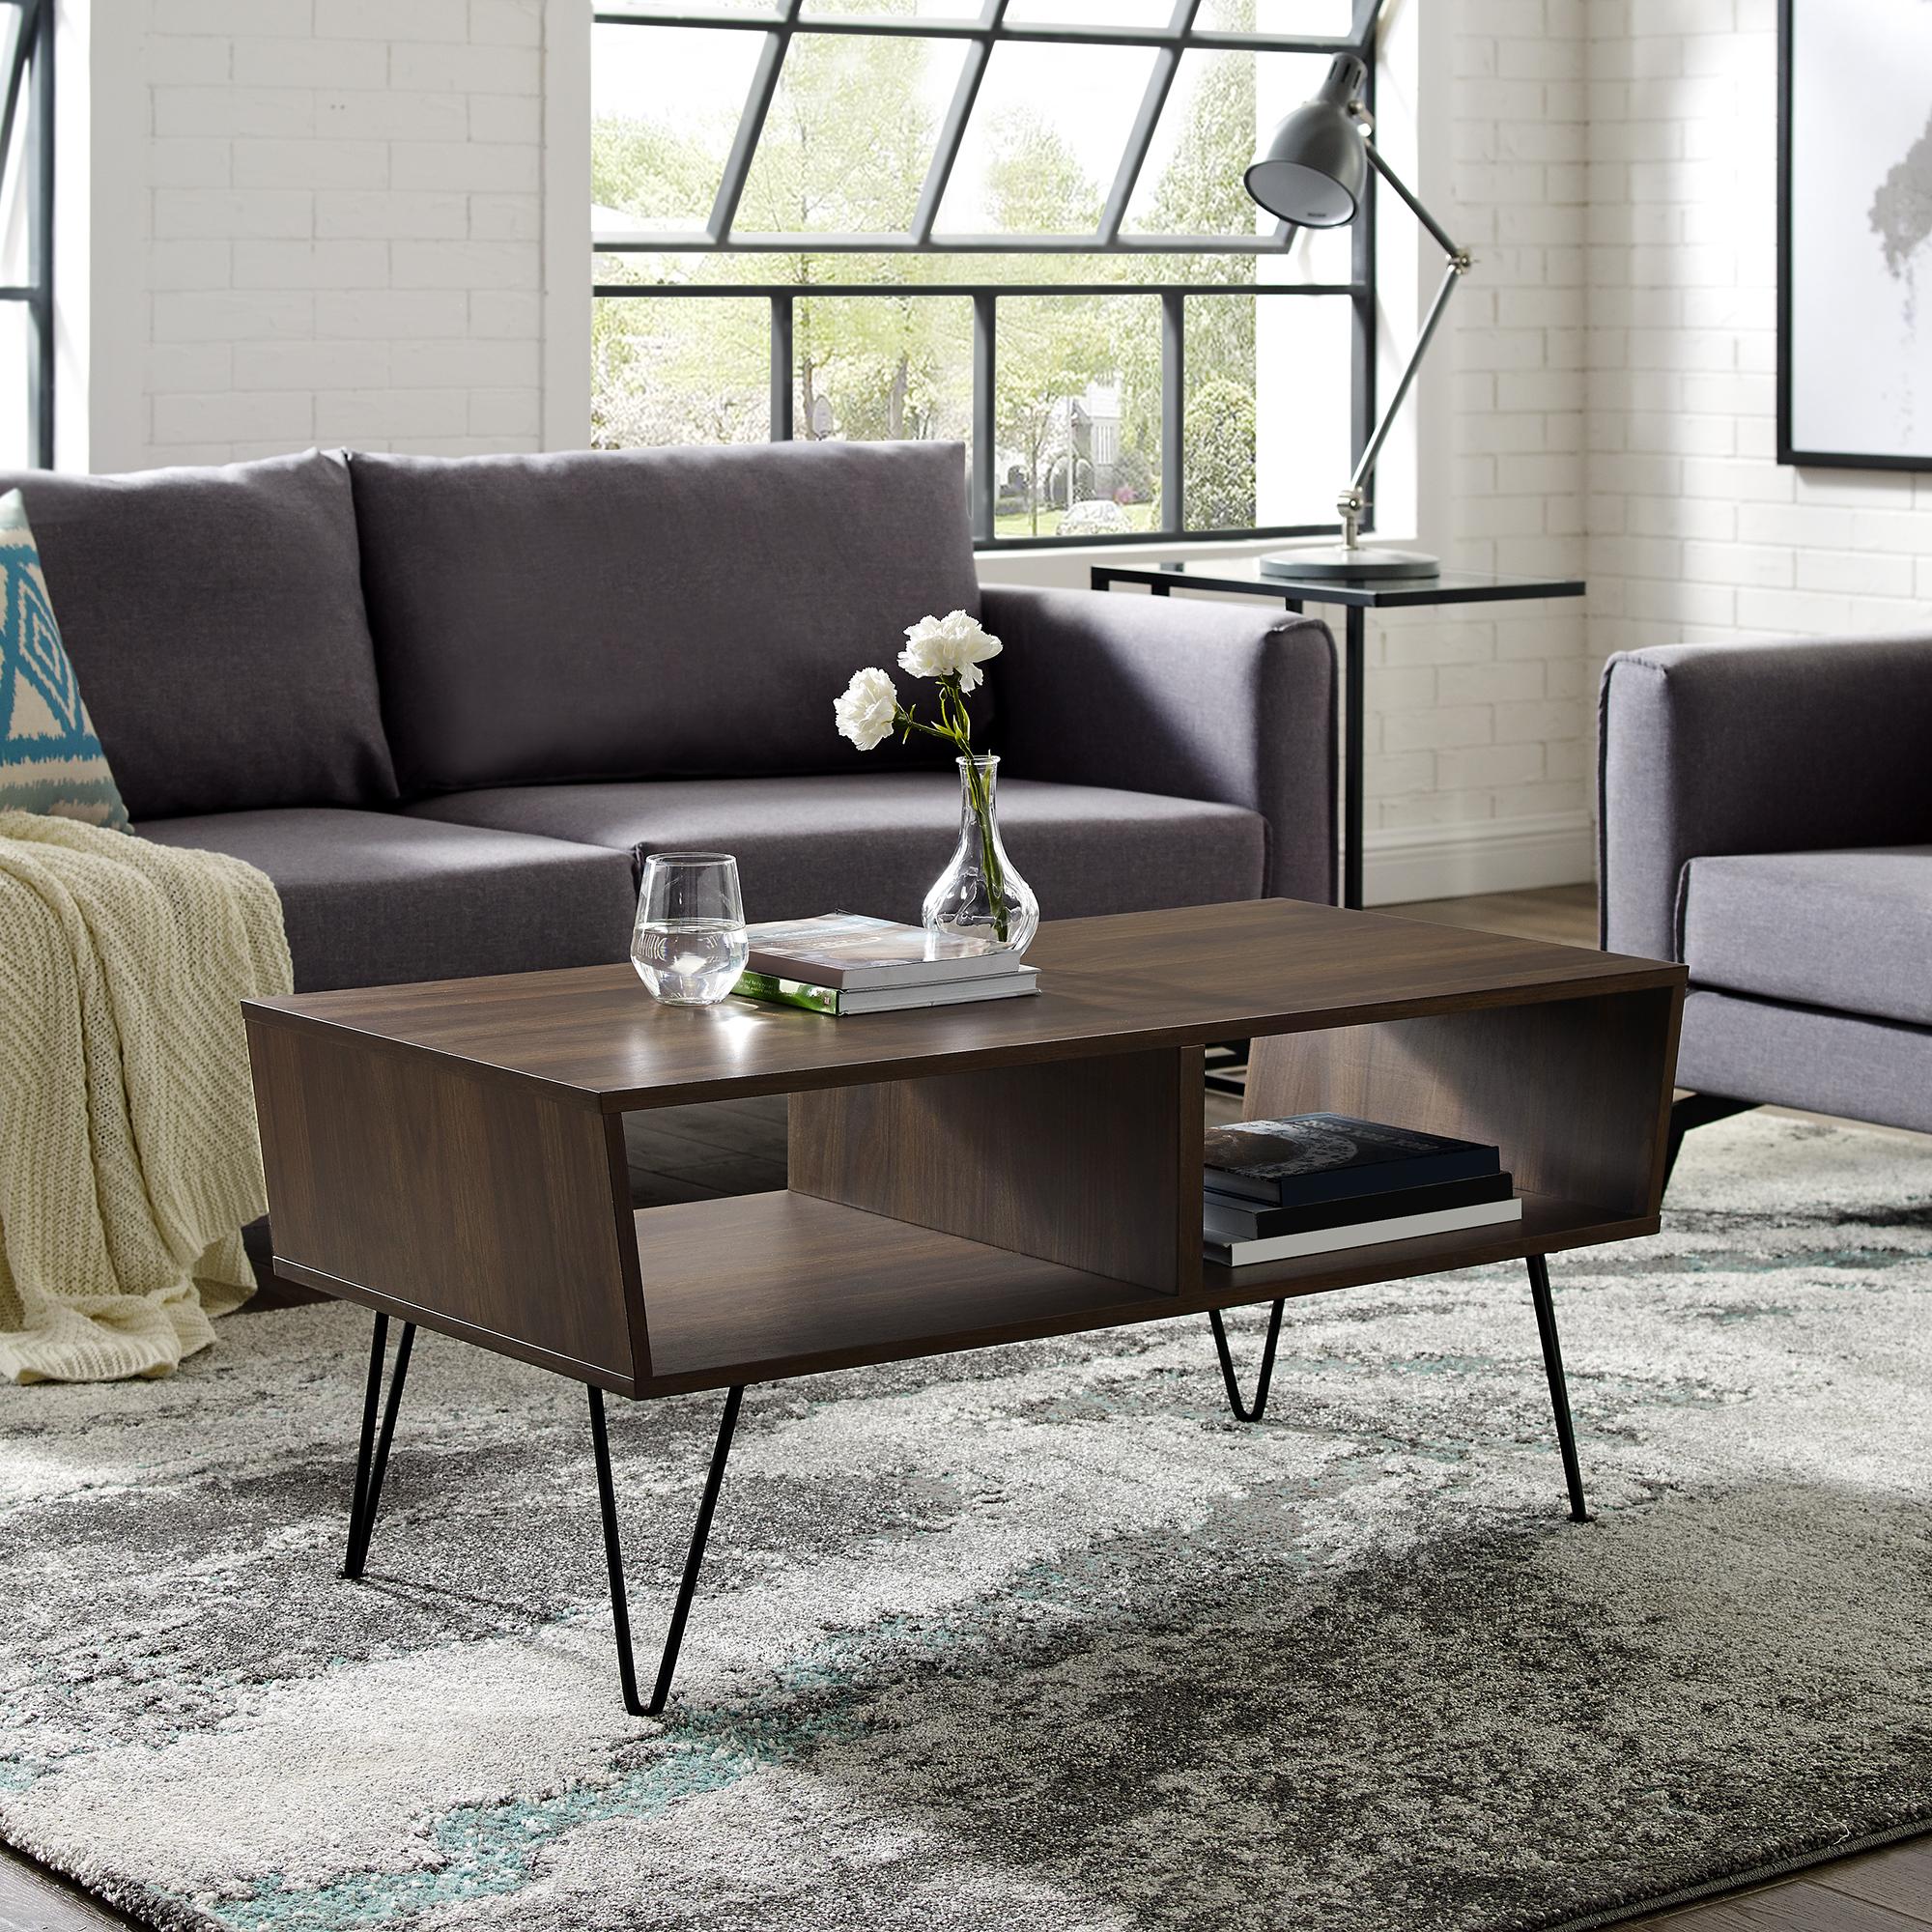 Manor Park Mid-Century Modern Wood Coffee Table (Dark Walnut) $129 + Free shipping